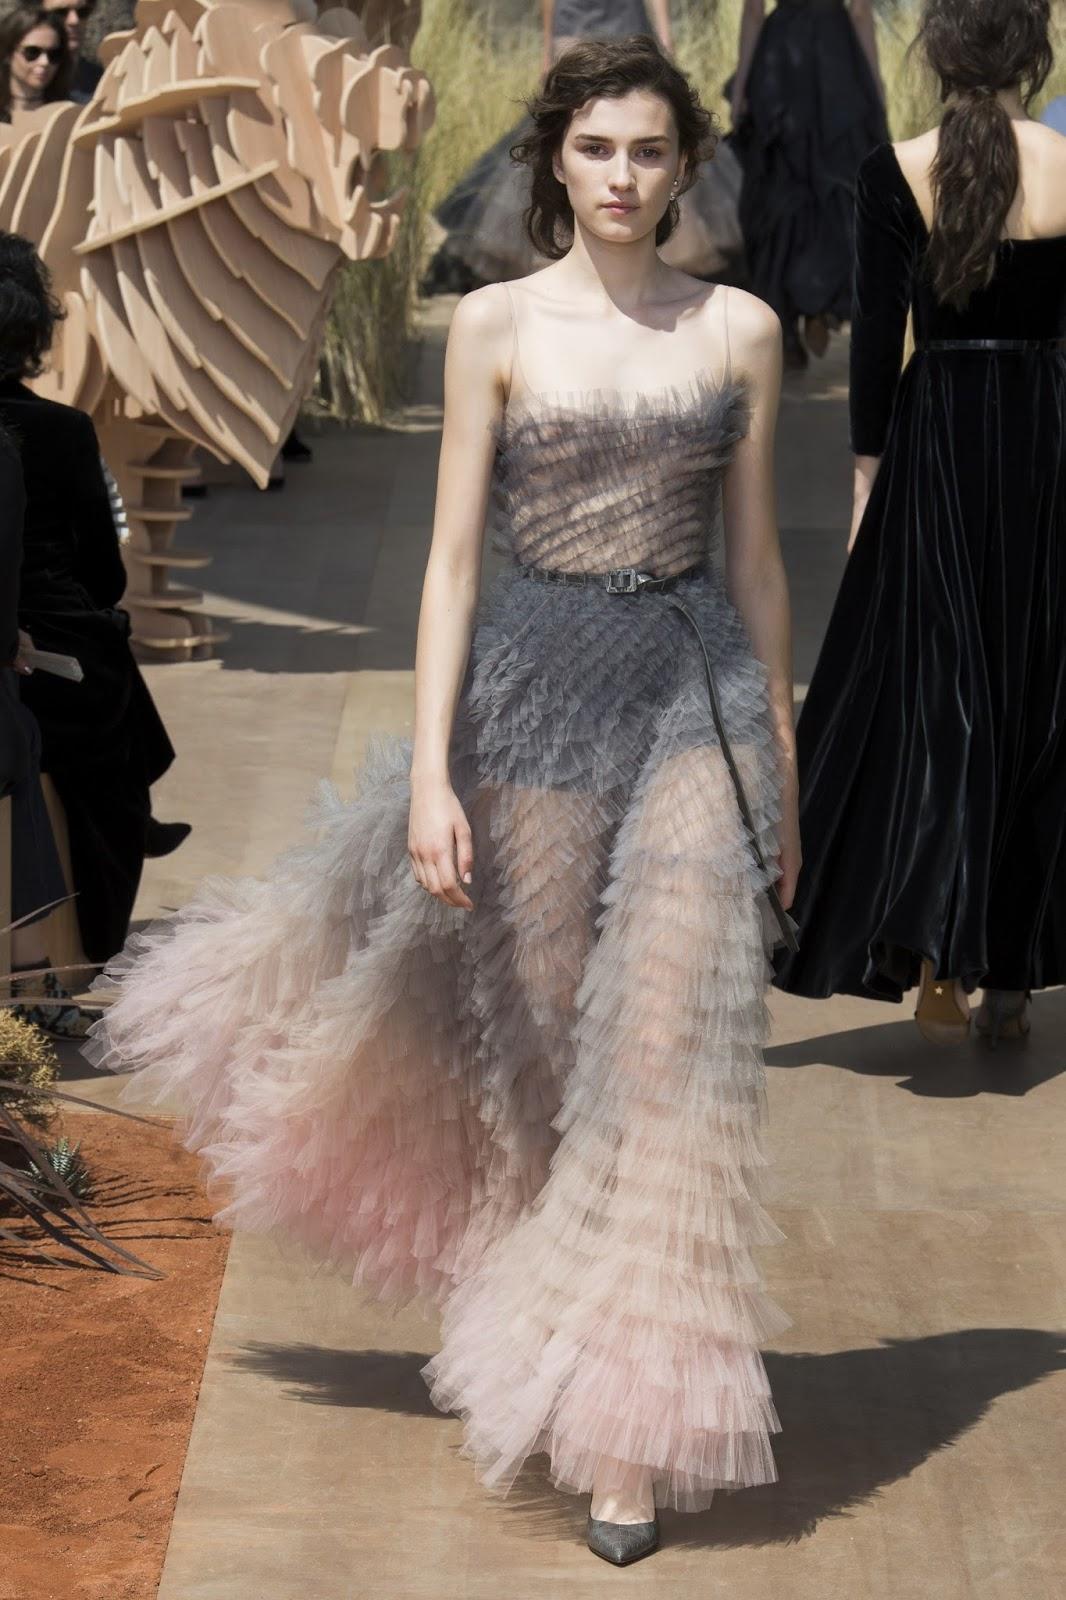 Picking dress stardoll fashion